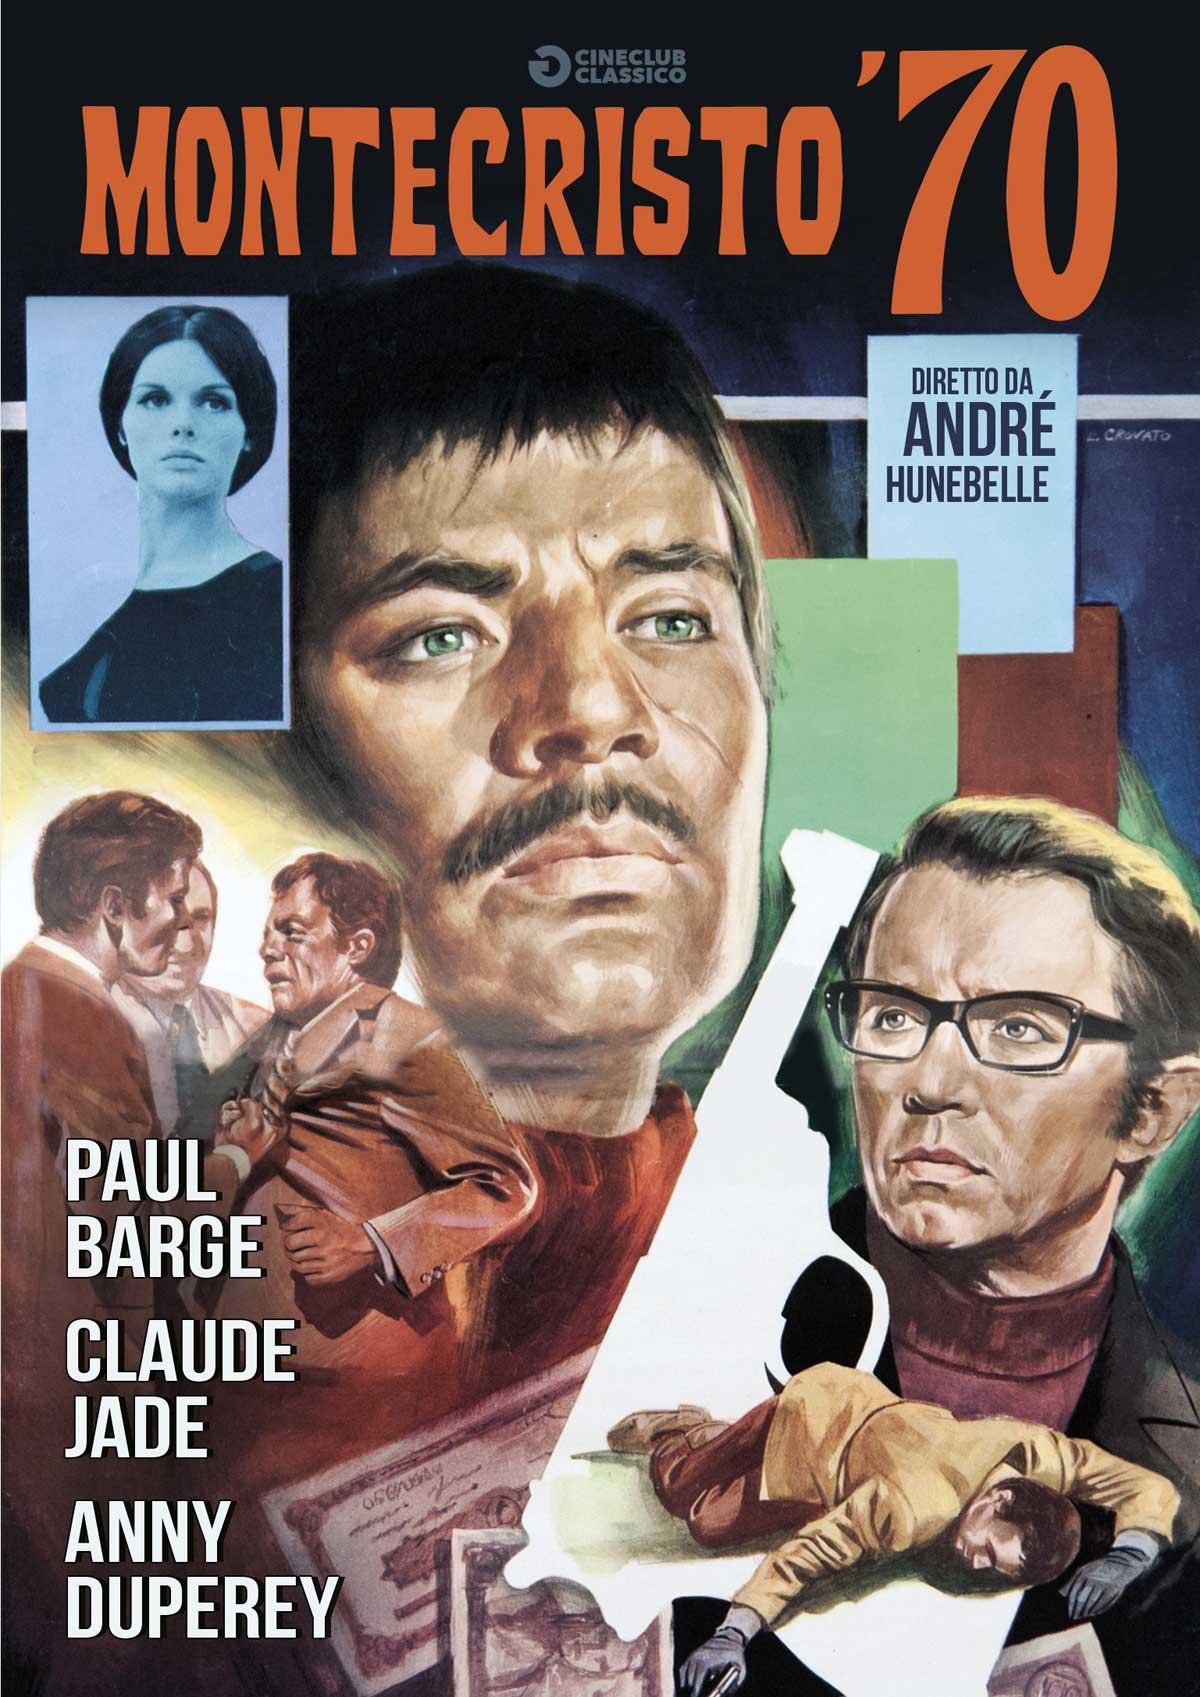 MONTECRISTO 70 (DVD)